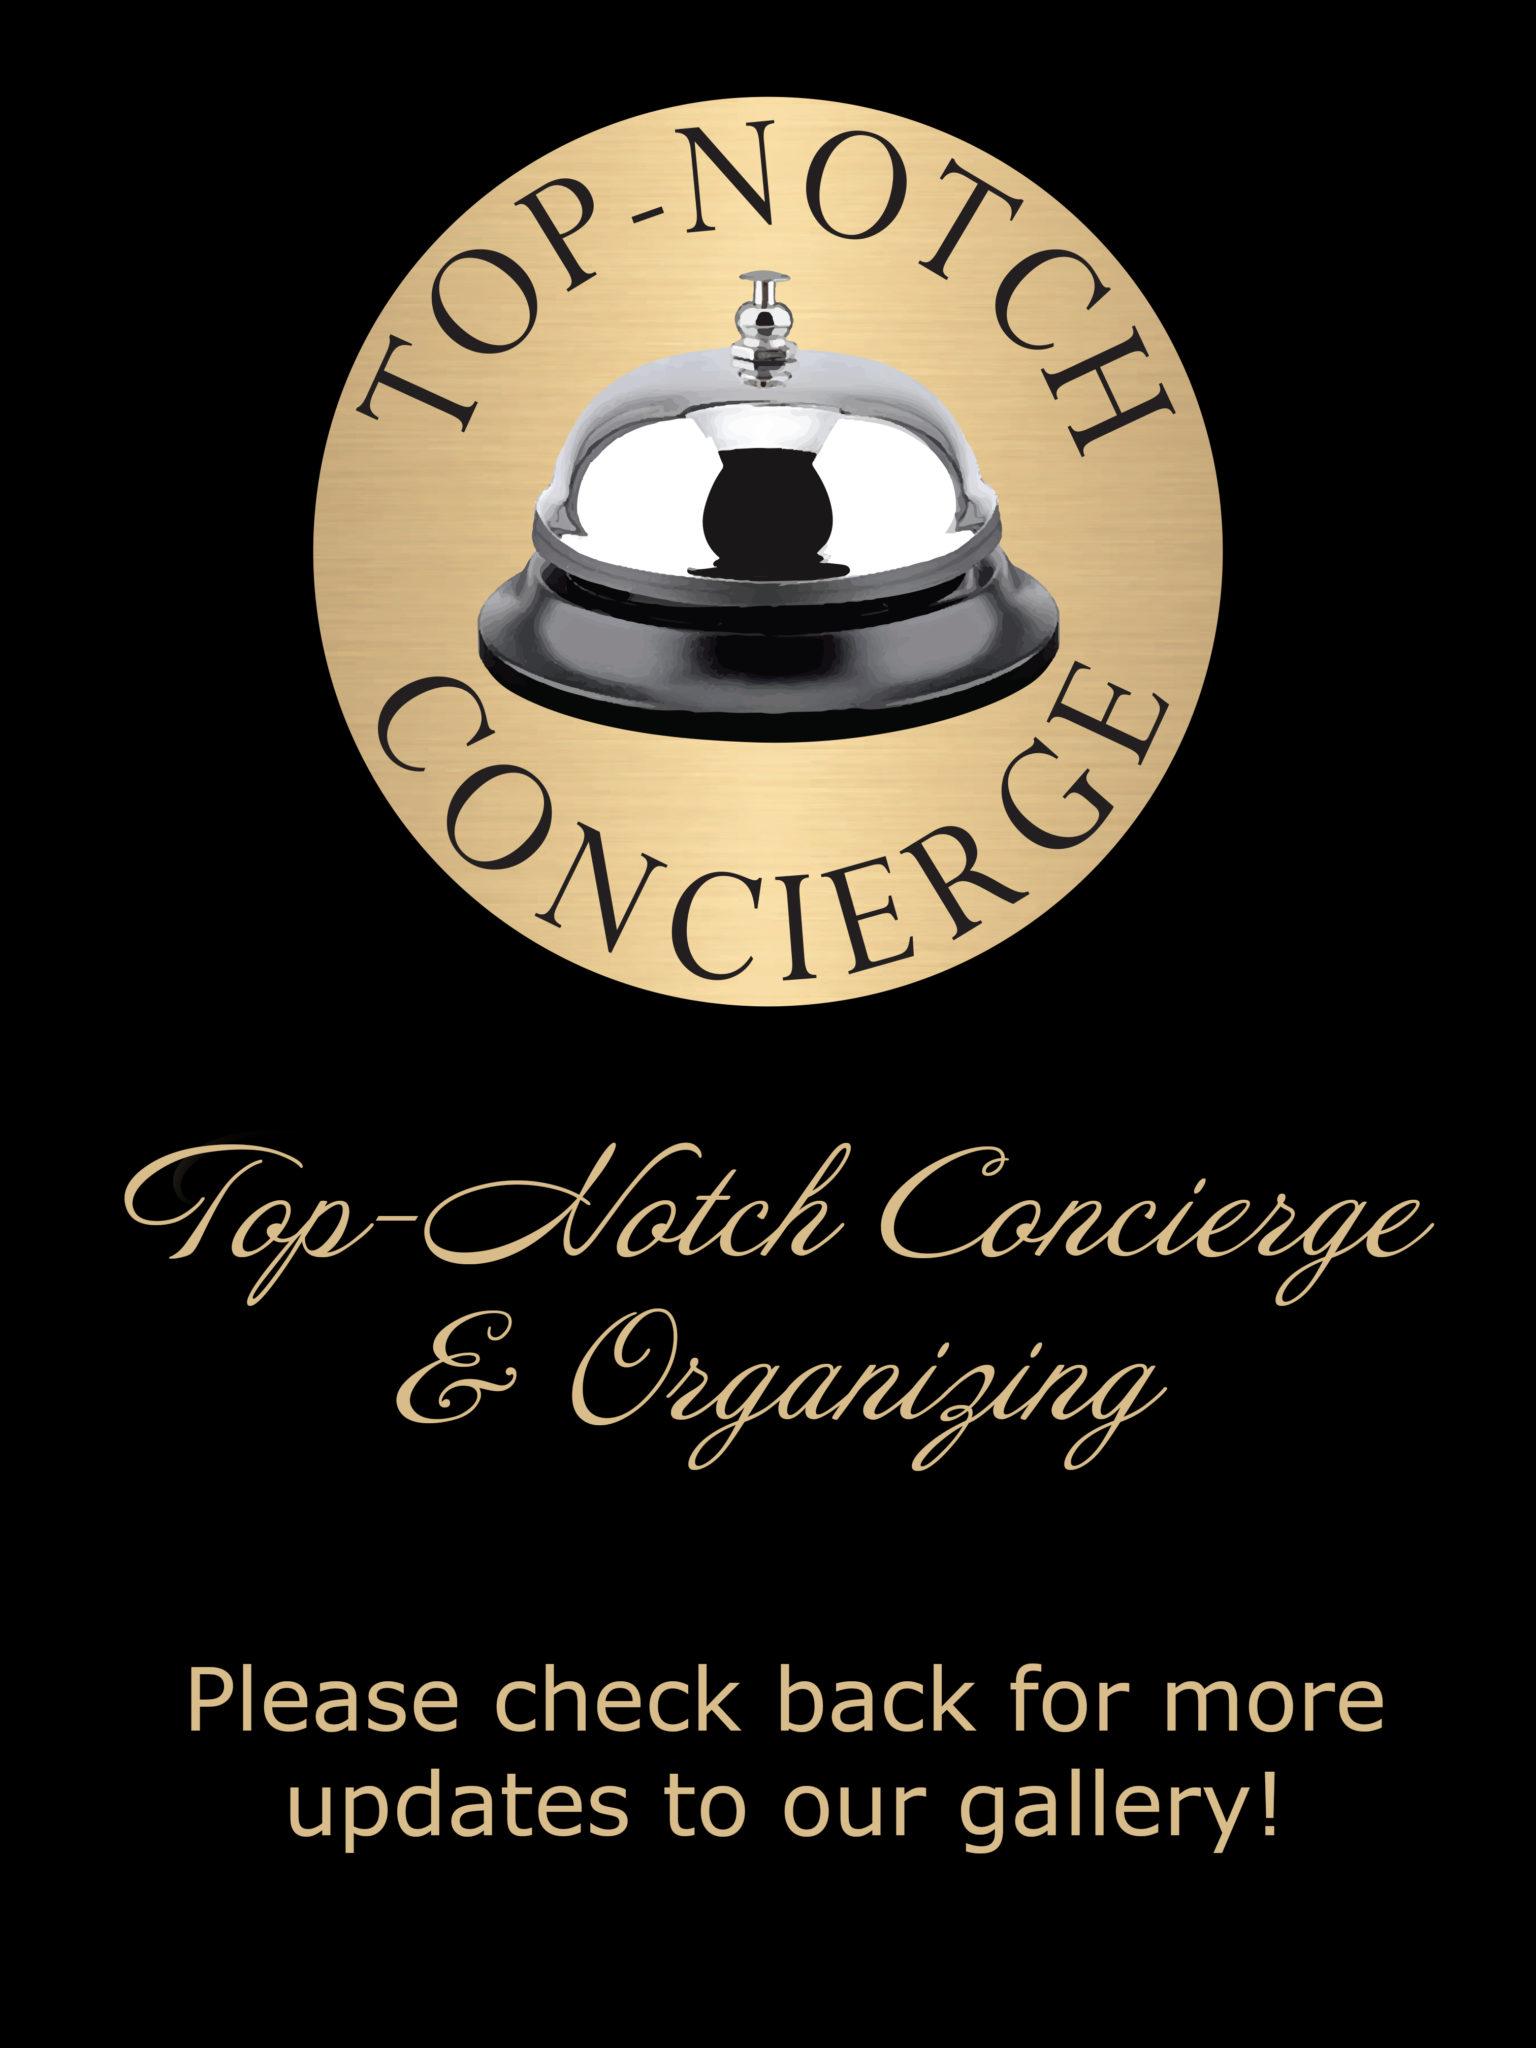 Top-Notch Concierge & Organizing